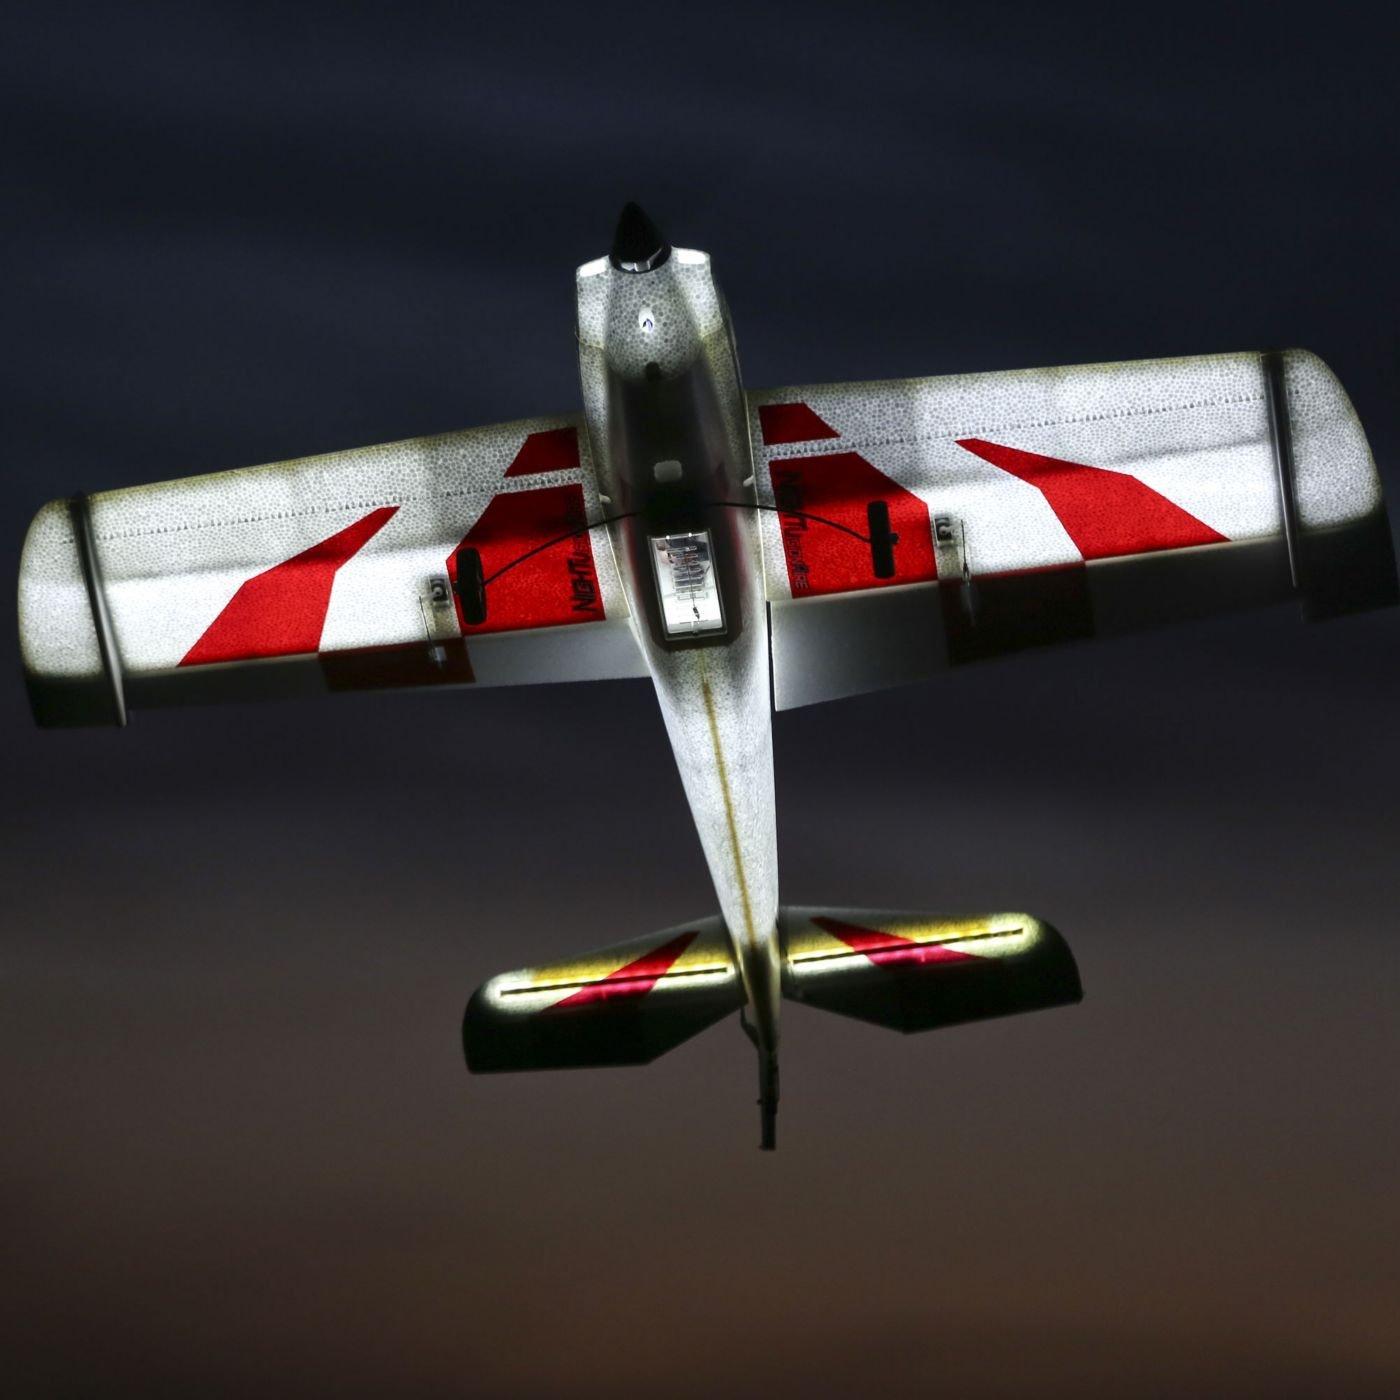 Amazon.com: E-flite NIGHTvisionaire BNF Basic RC Airplane: Toys & Games